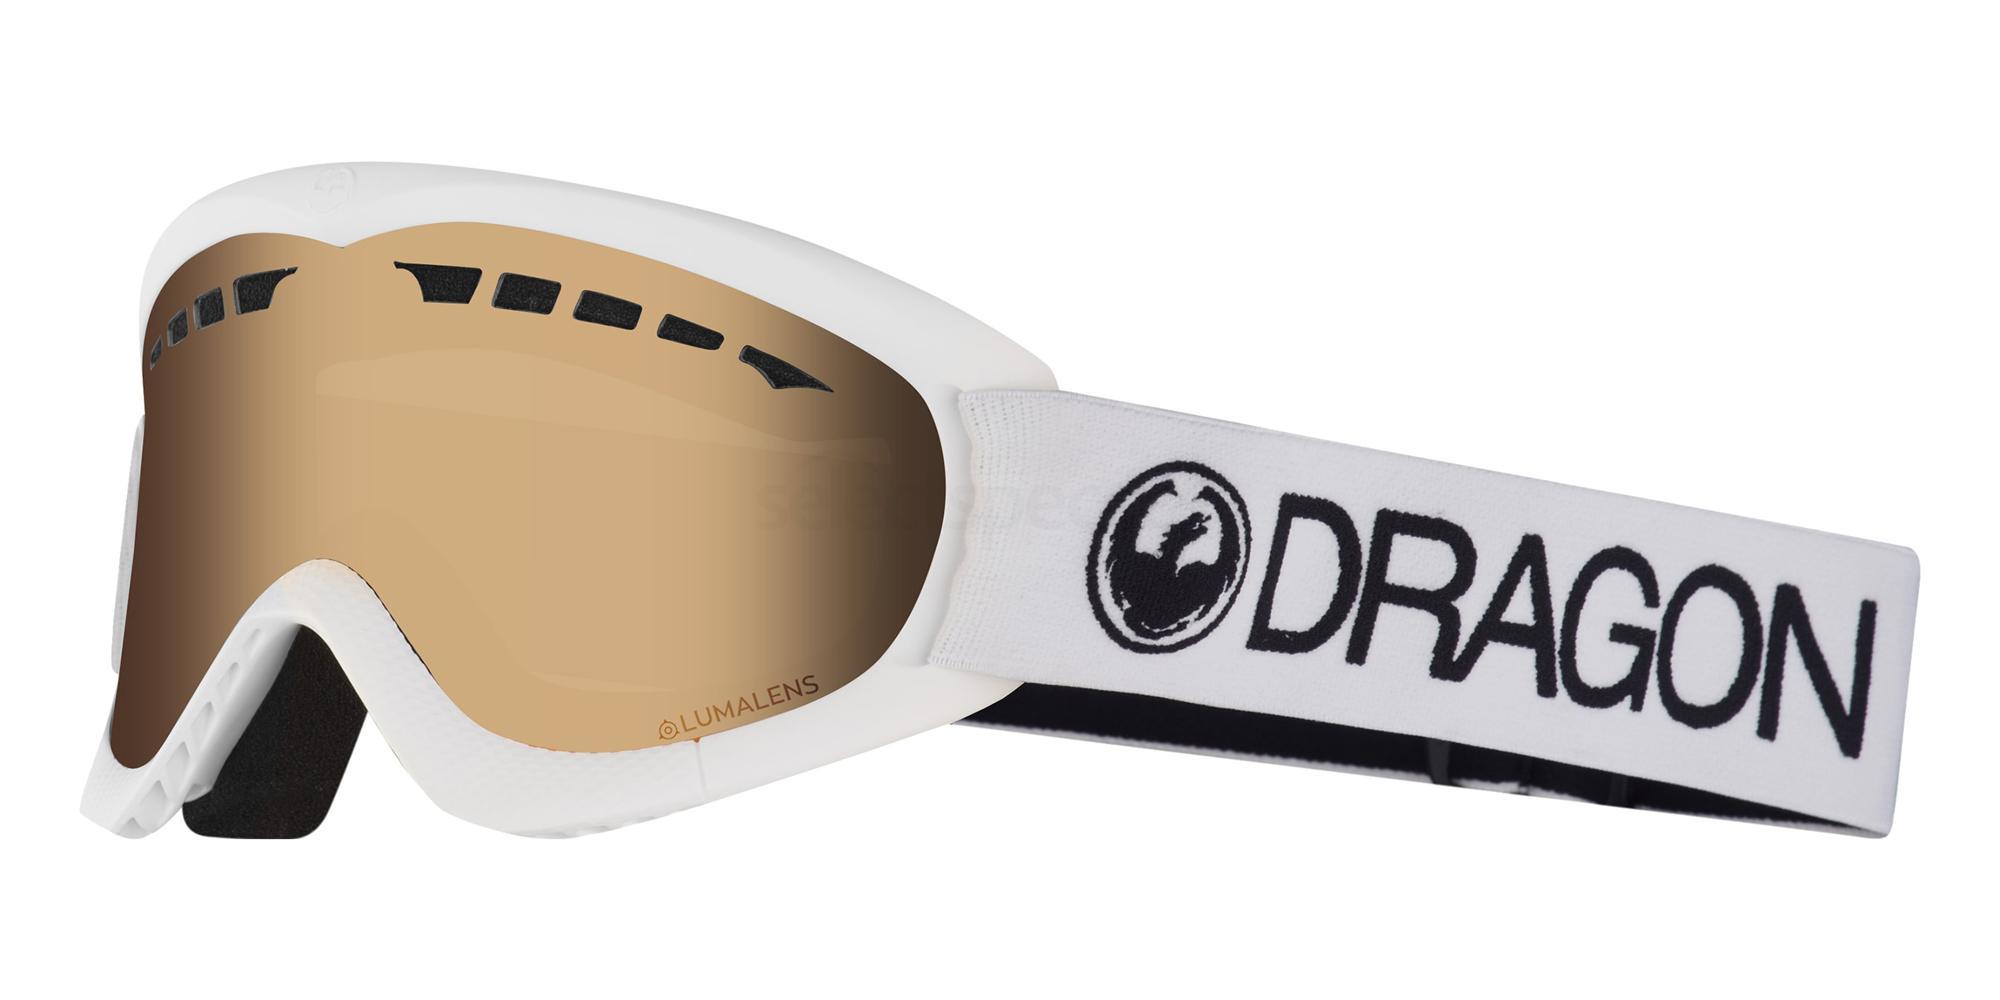 198 DR DXS 6 Goggles, Dragon